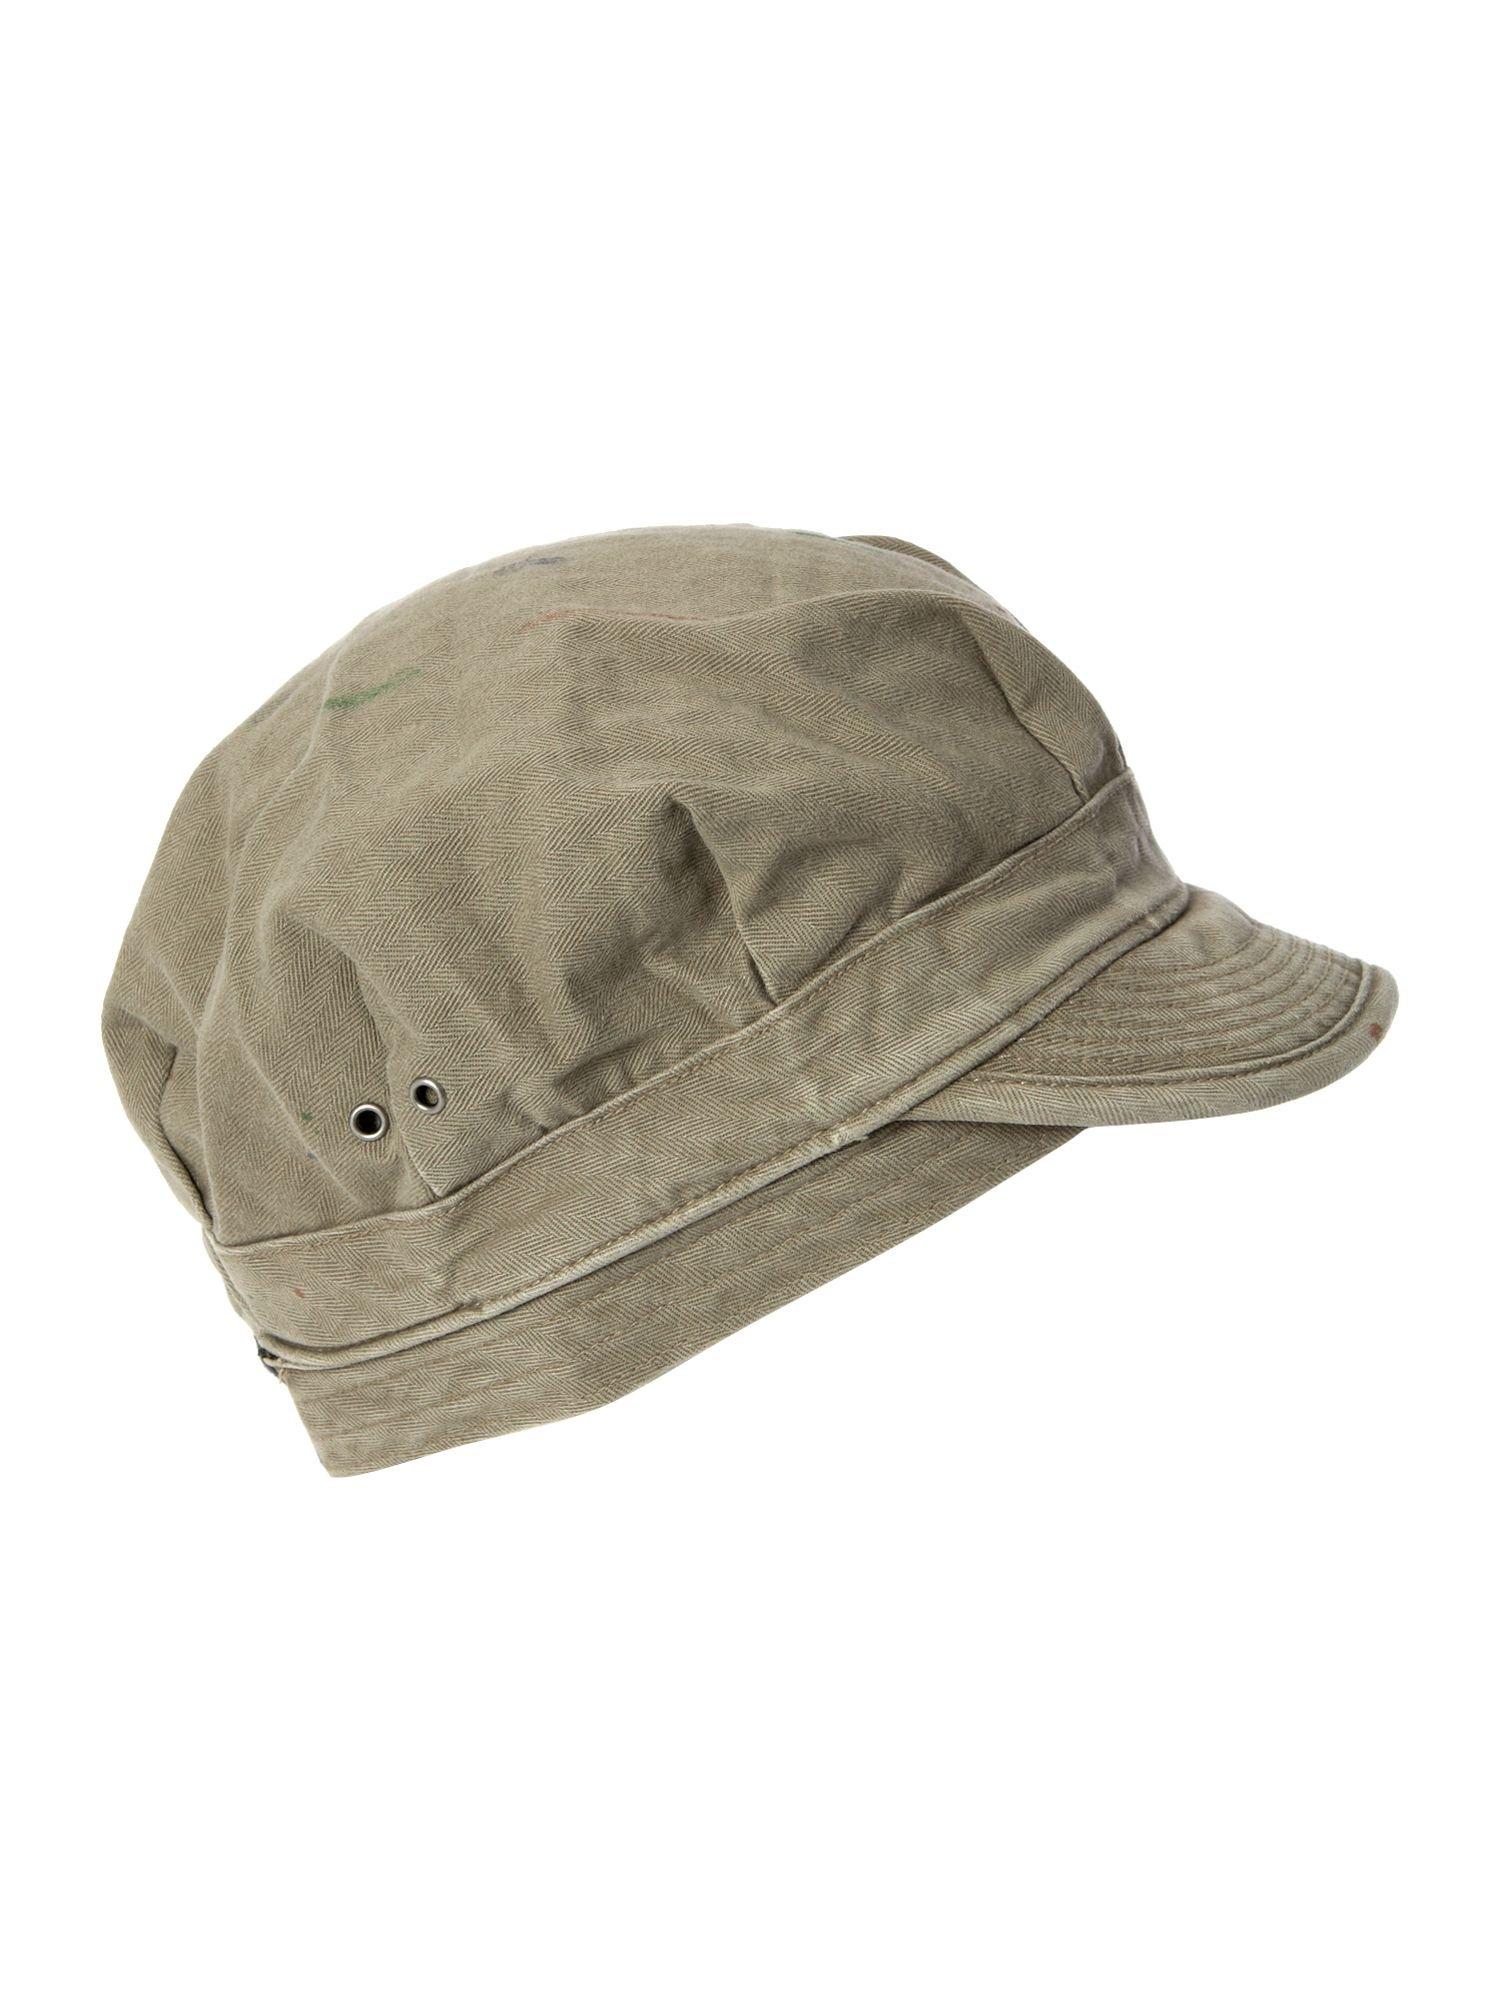 denim supply ralph lauren military cap in khaki for men olive lyst. Black Bedroom Furniture Sets. Home Design Ideas